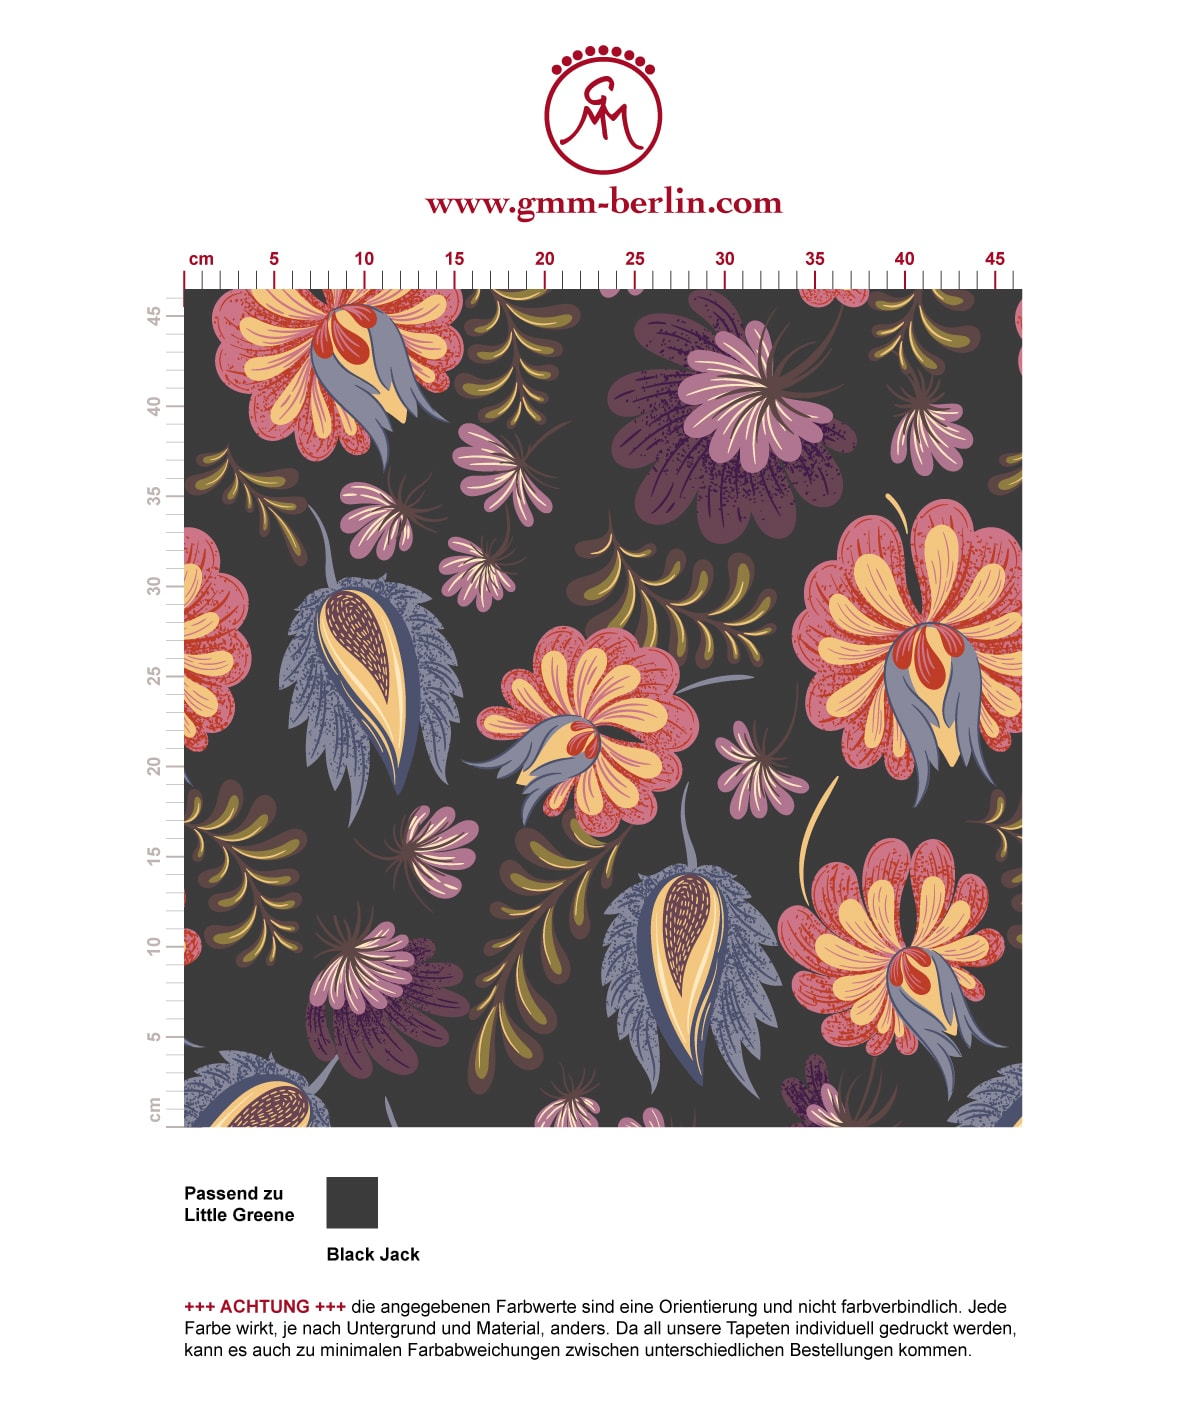 grau rosa florale Tapete mit großen Blüten angepasst an Little Greene Wandfarbe. Aus dem GMM-BERLIN.com Sortiment: Schöne Tapeten in der Farbe: rosa